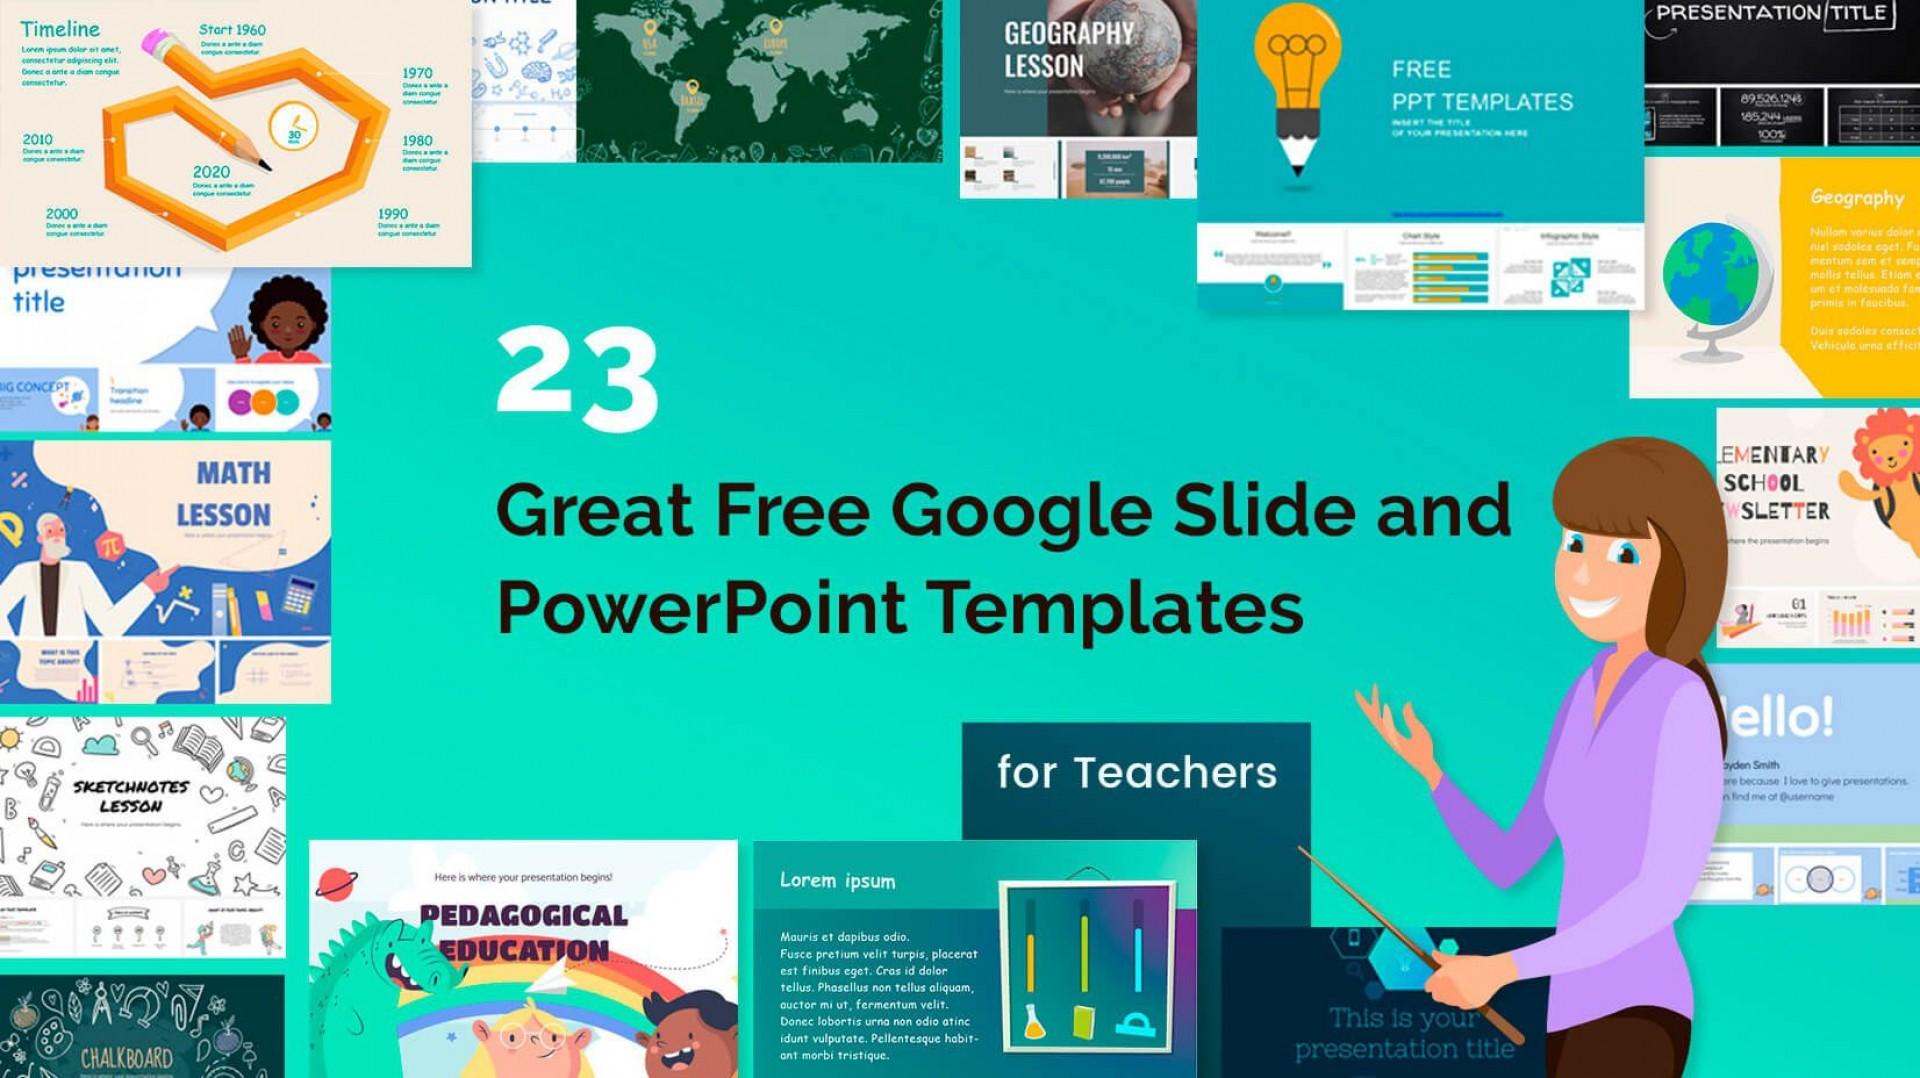 004 Exceptional Google Doc Powerpoint Template Design  Templates Presentation1920